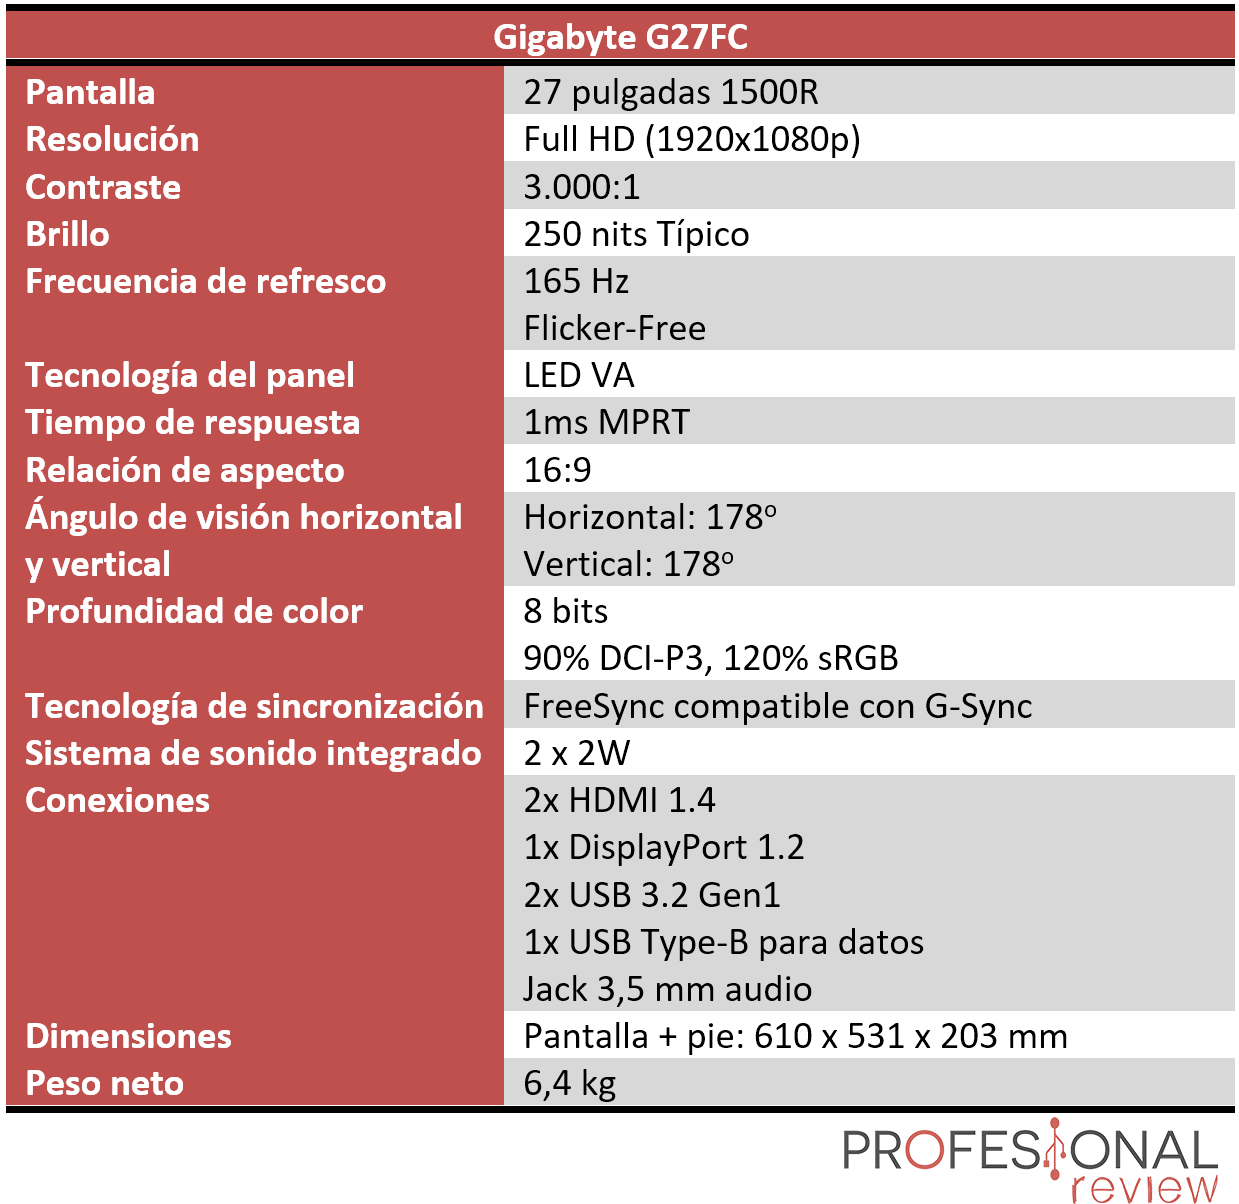 Gigabyte G27FC Características